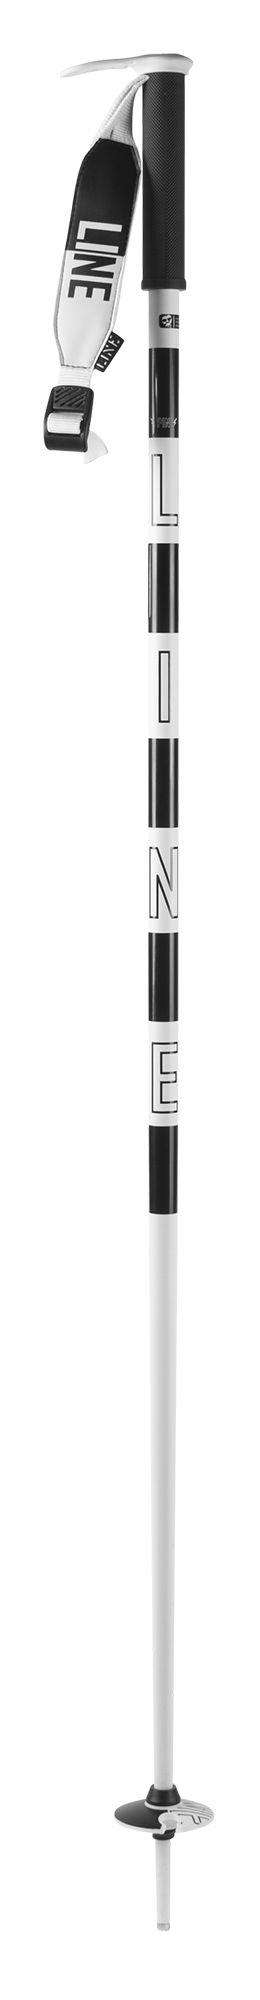 Line 1617 pin pole pole?wid=260&hei=440&op sharpen=1&resmode=bilin&op usm=.3,